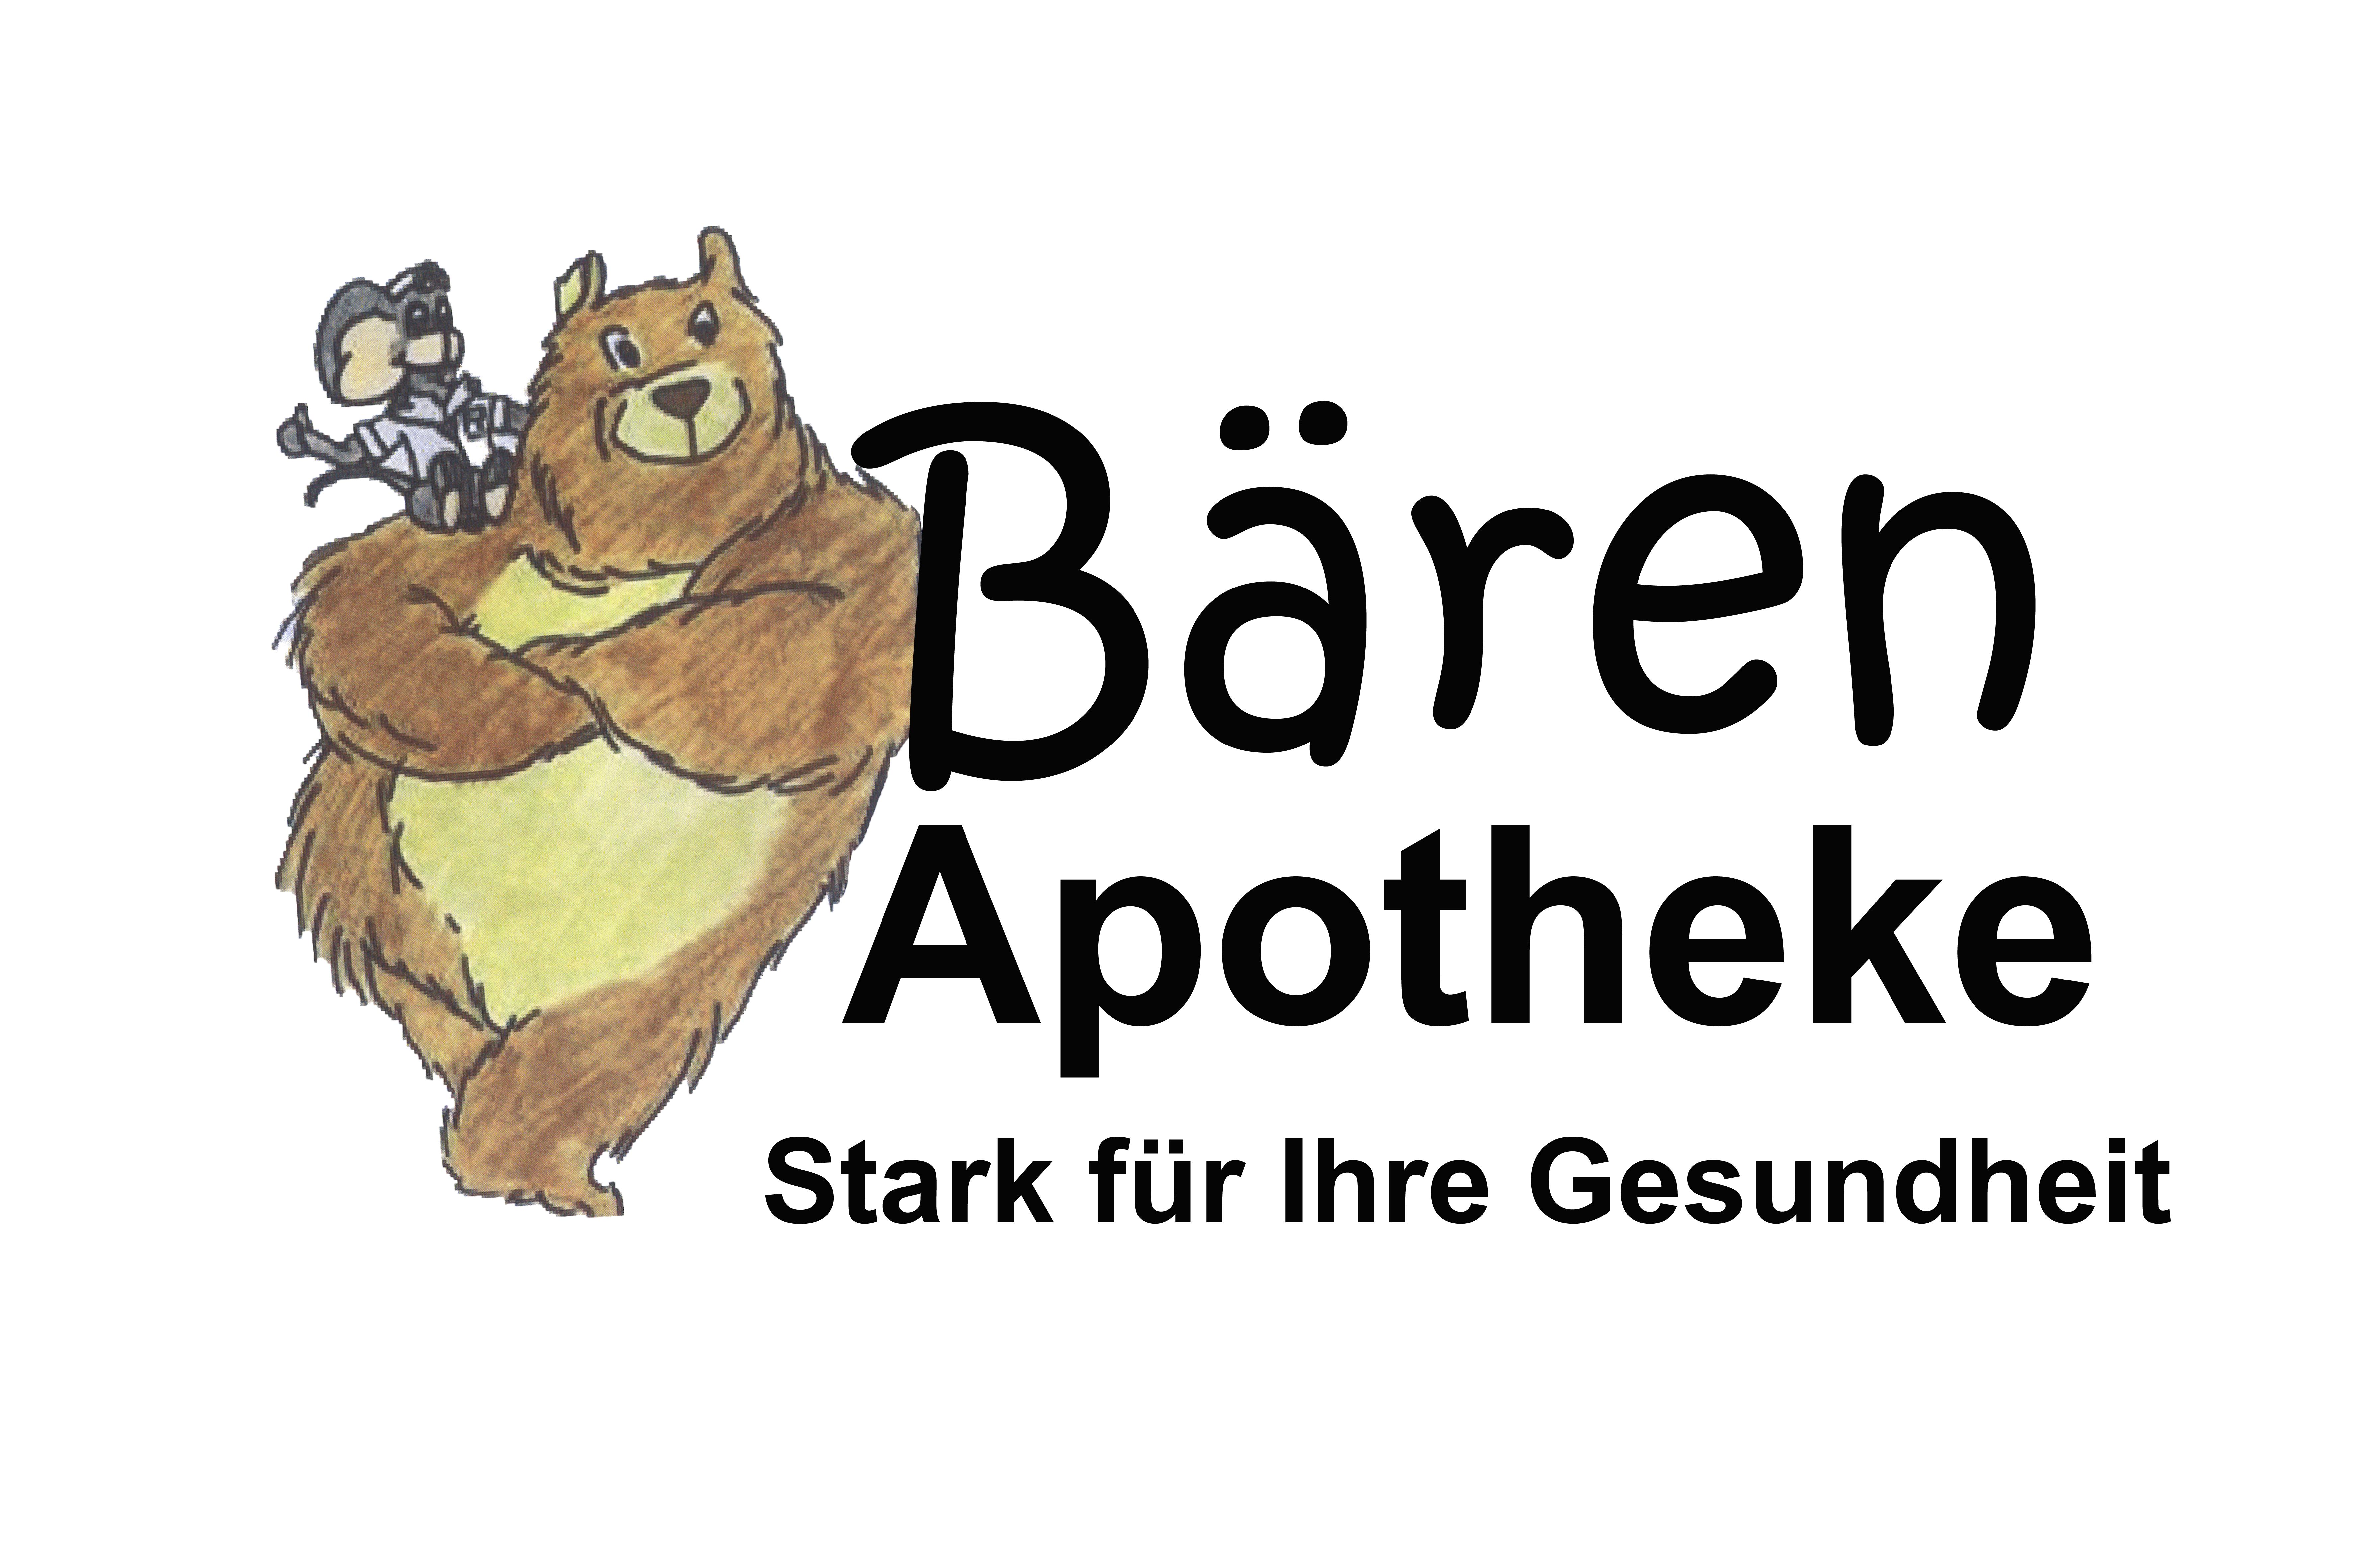 Bären Apotheke